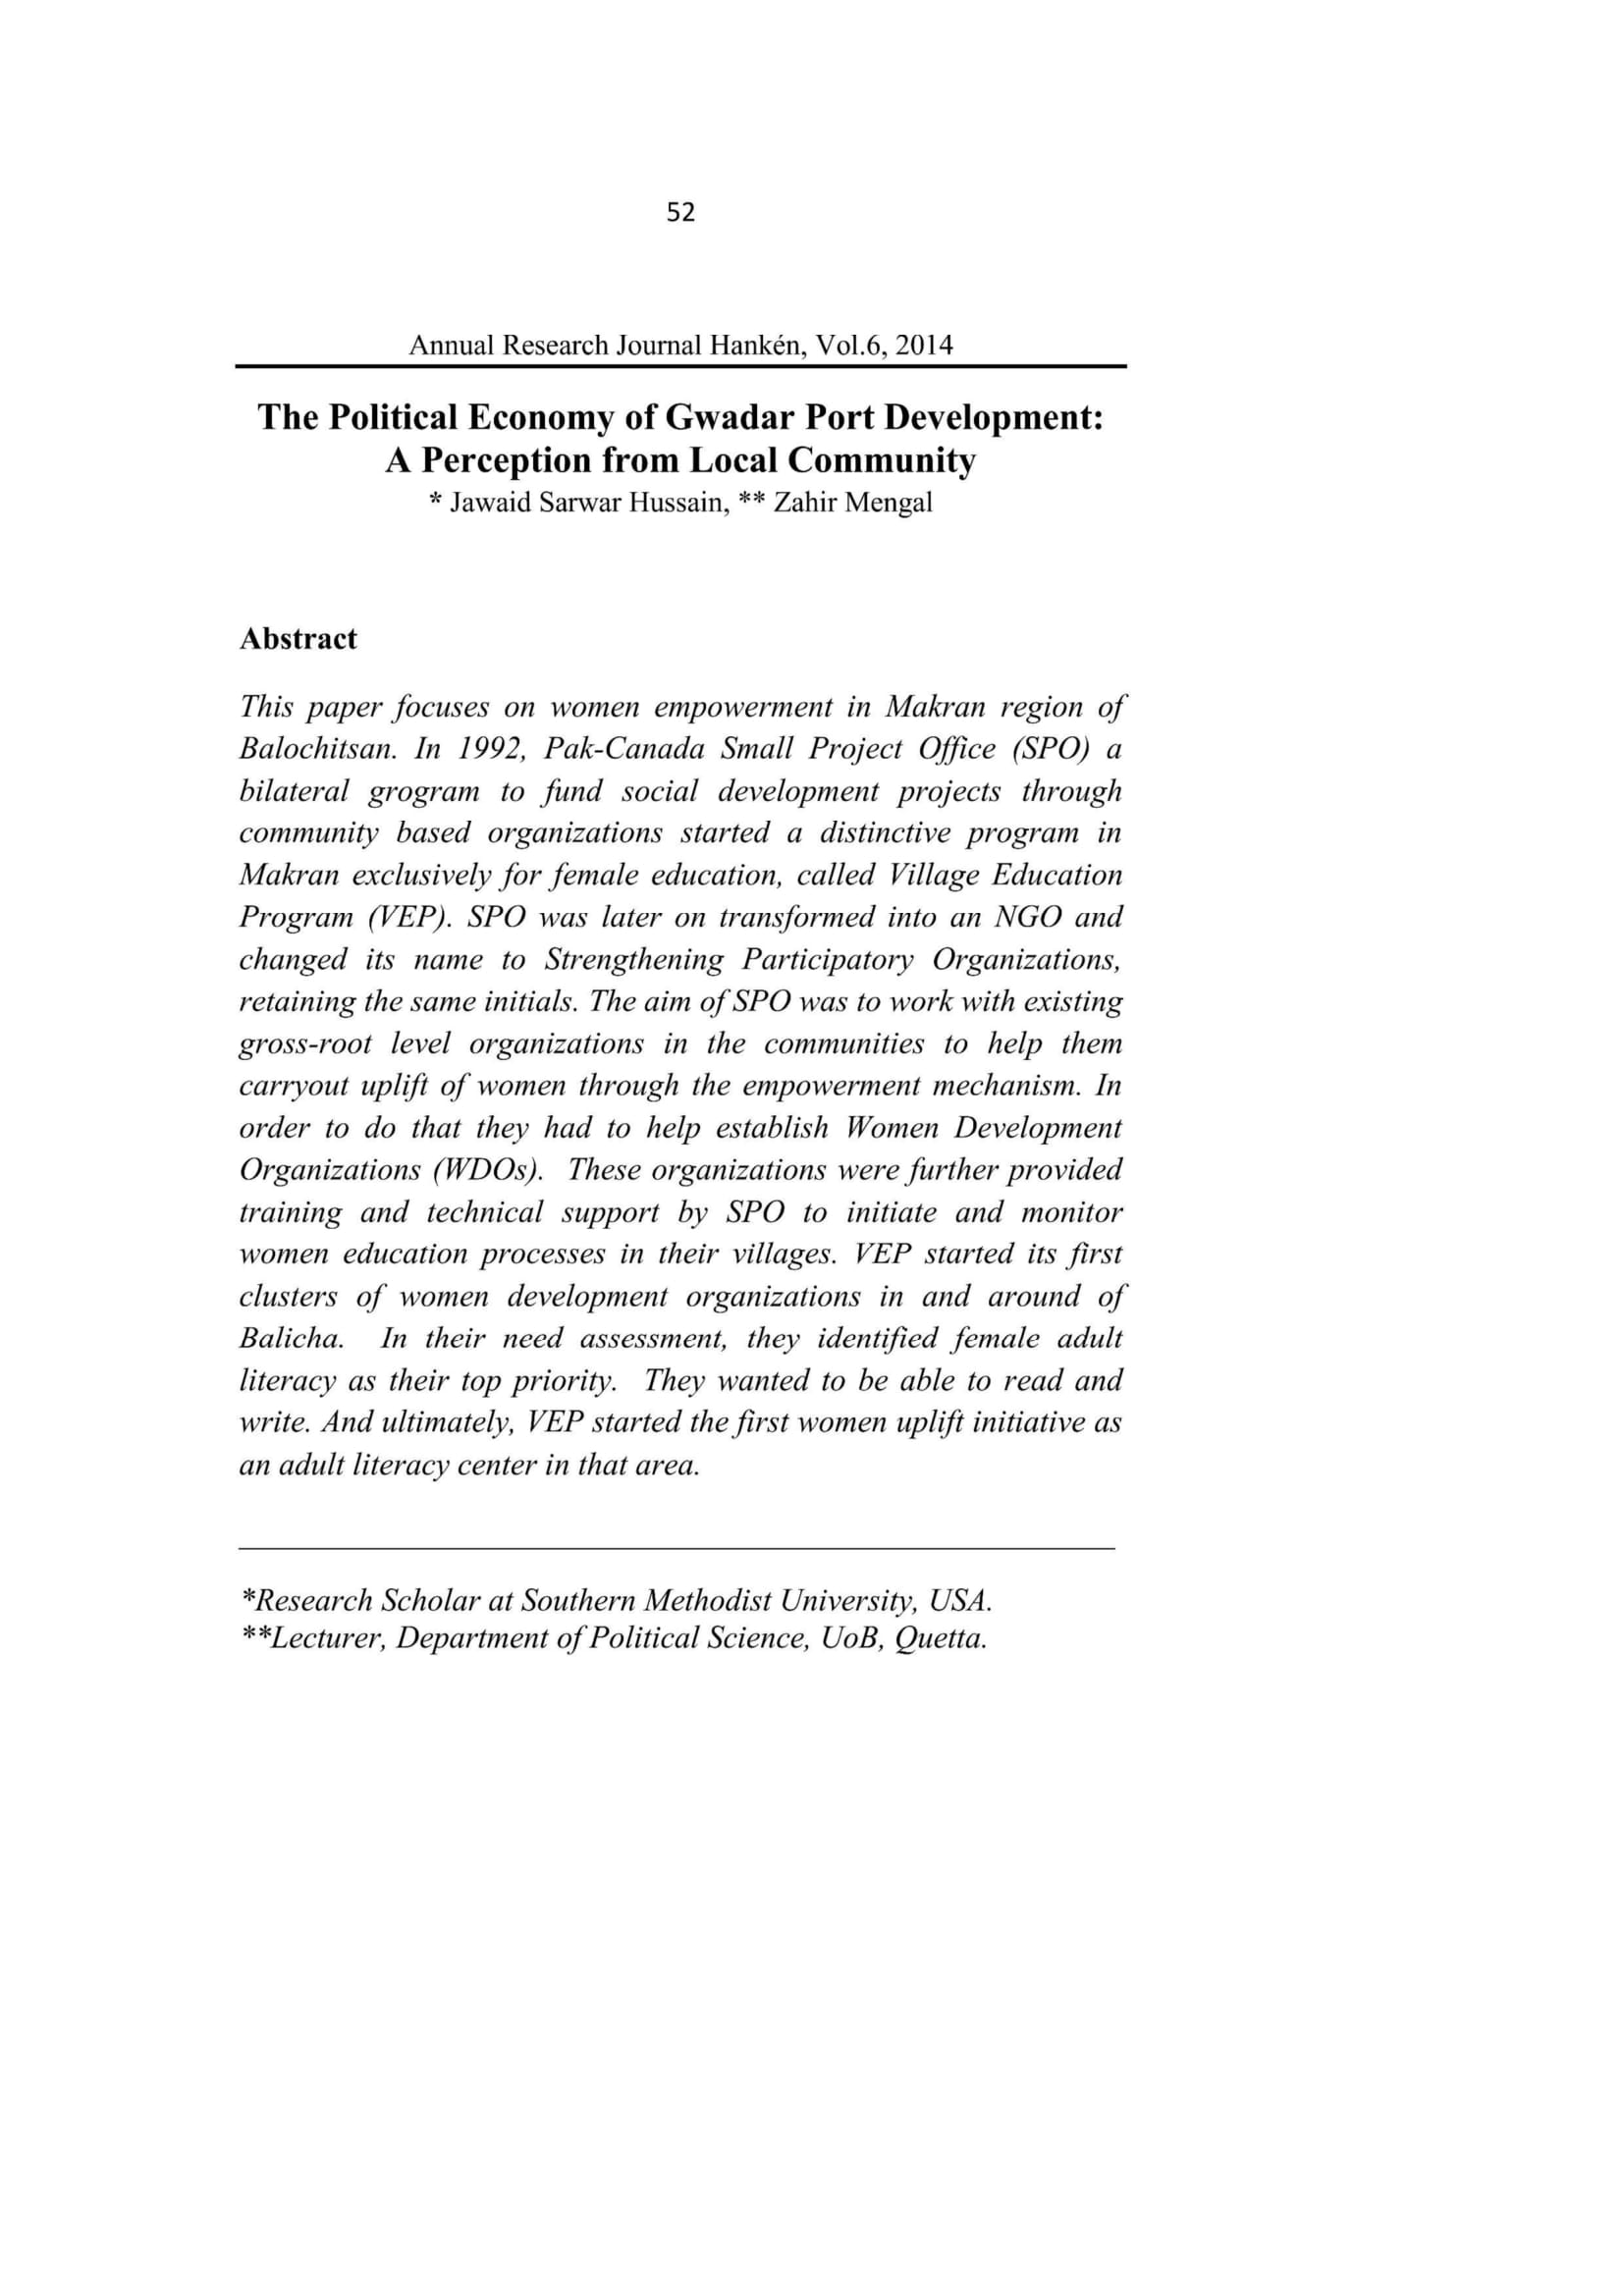 The Empowerment of Baloch Women: a Makrani Perspective